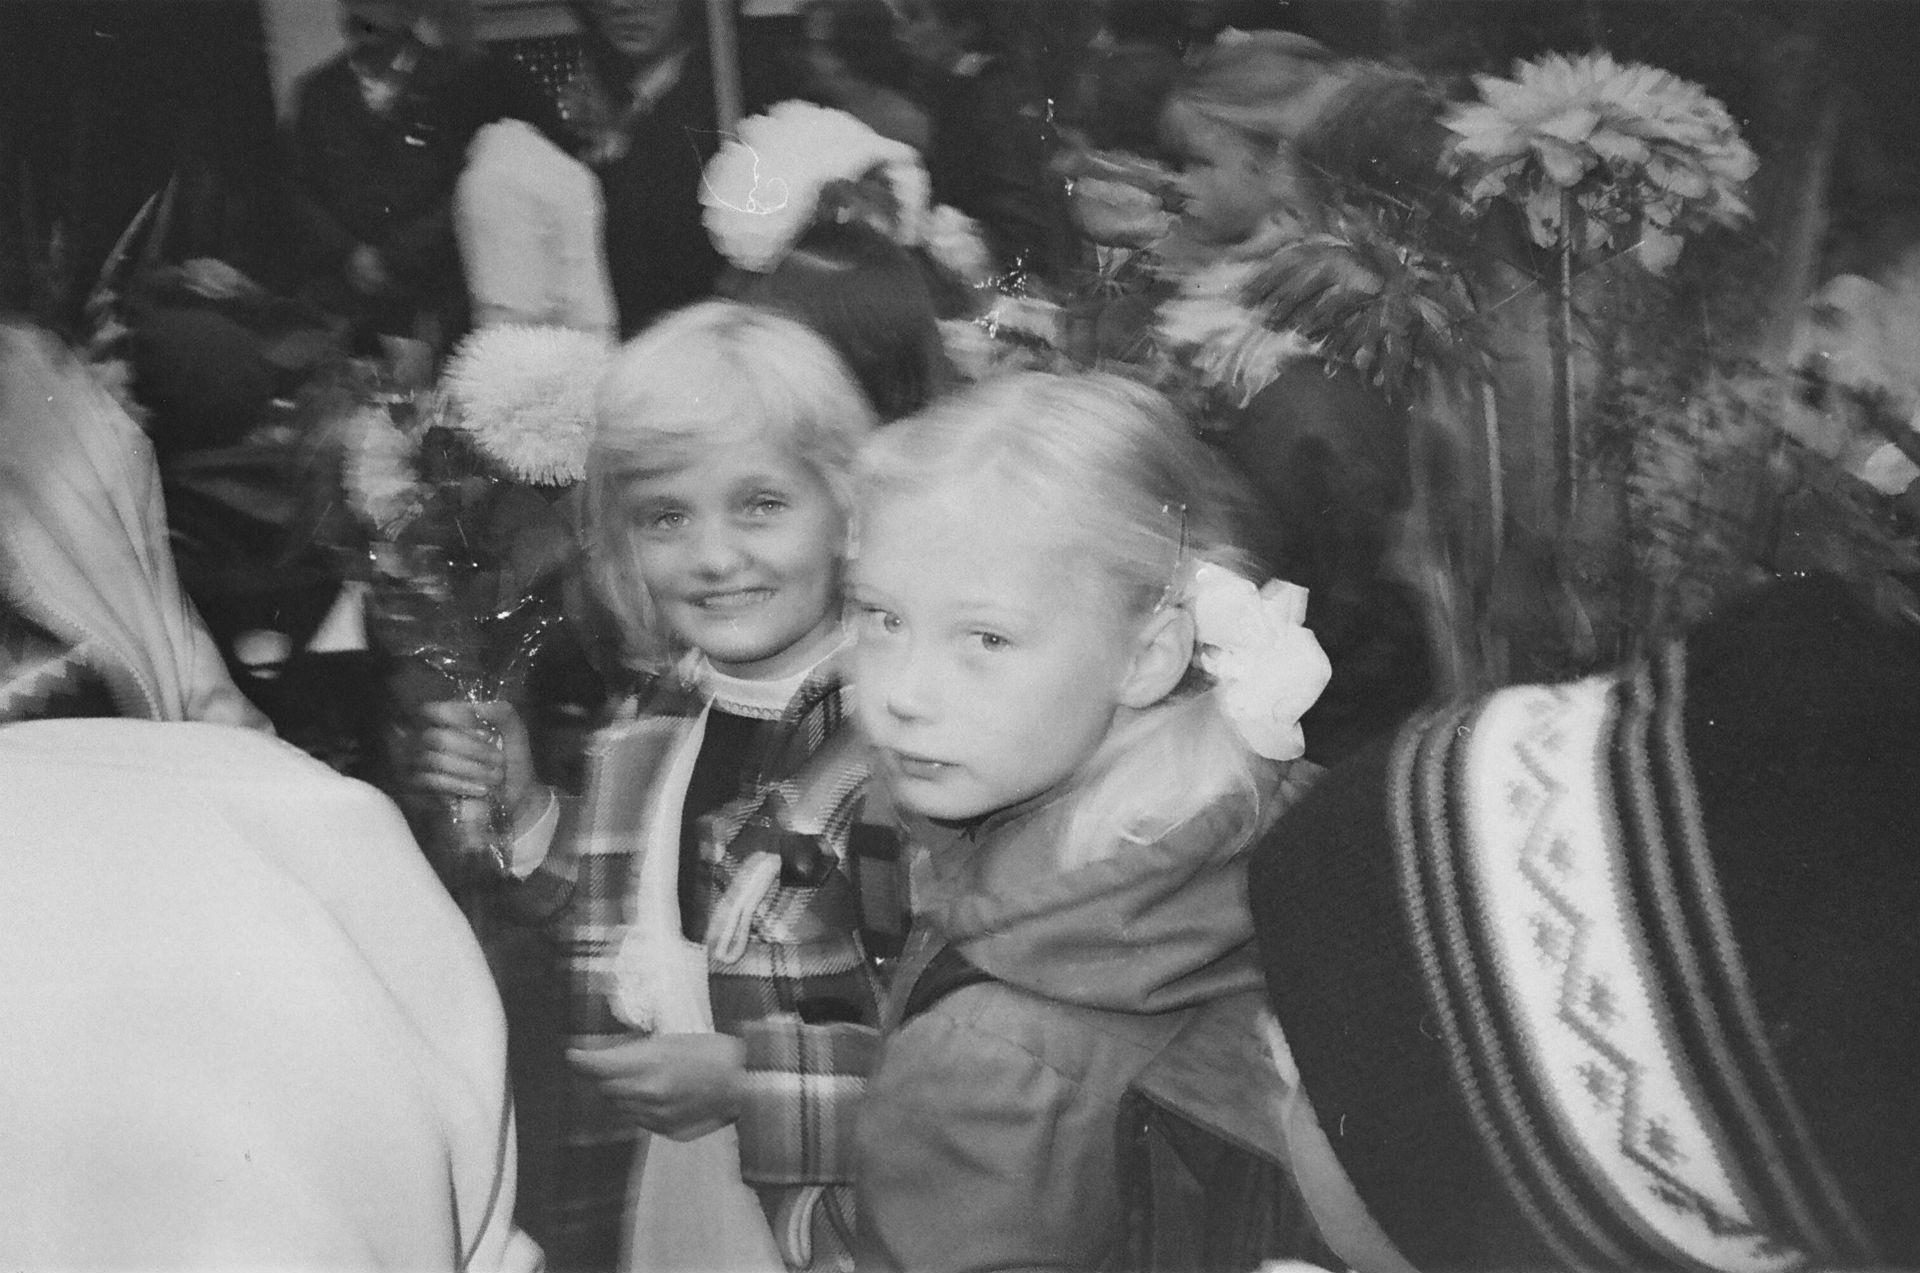 La fille de la marraine de Dmitri, Ioulia